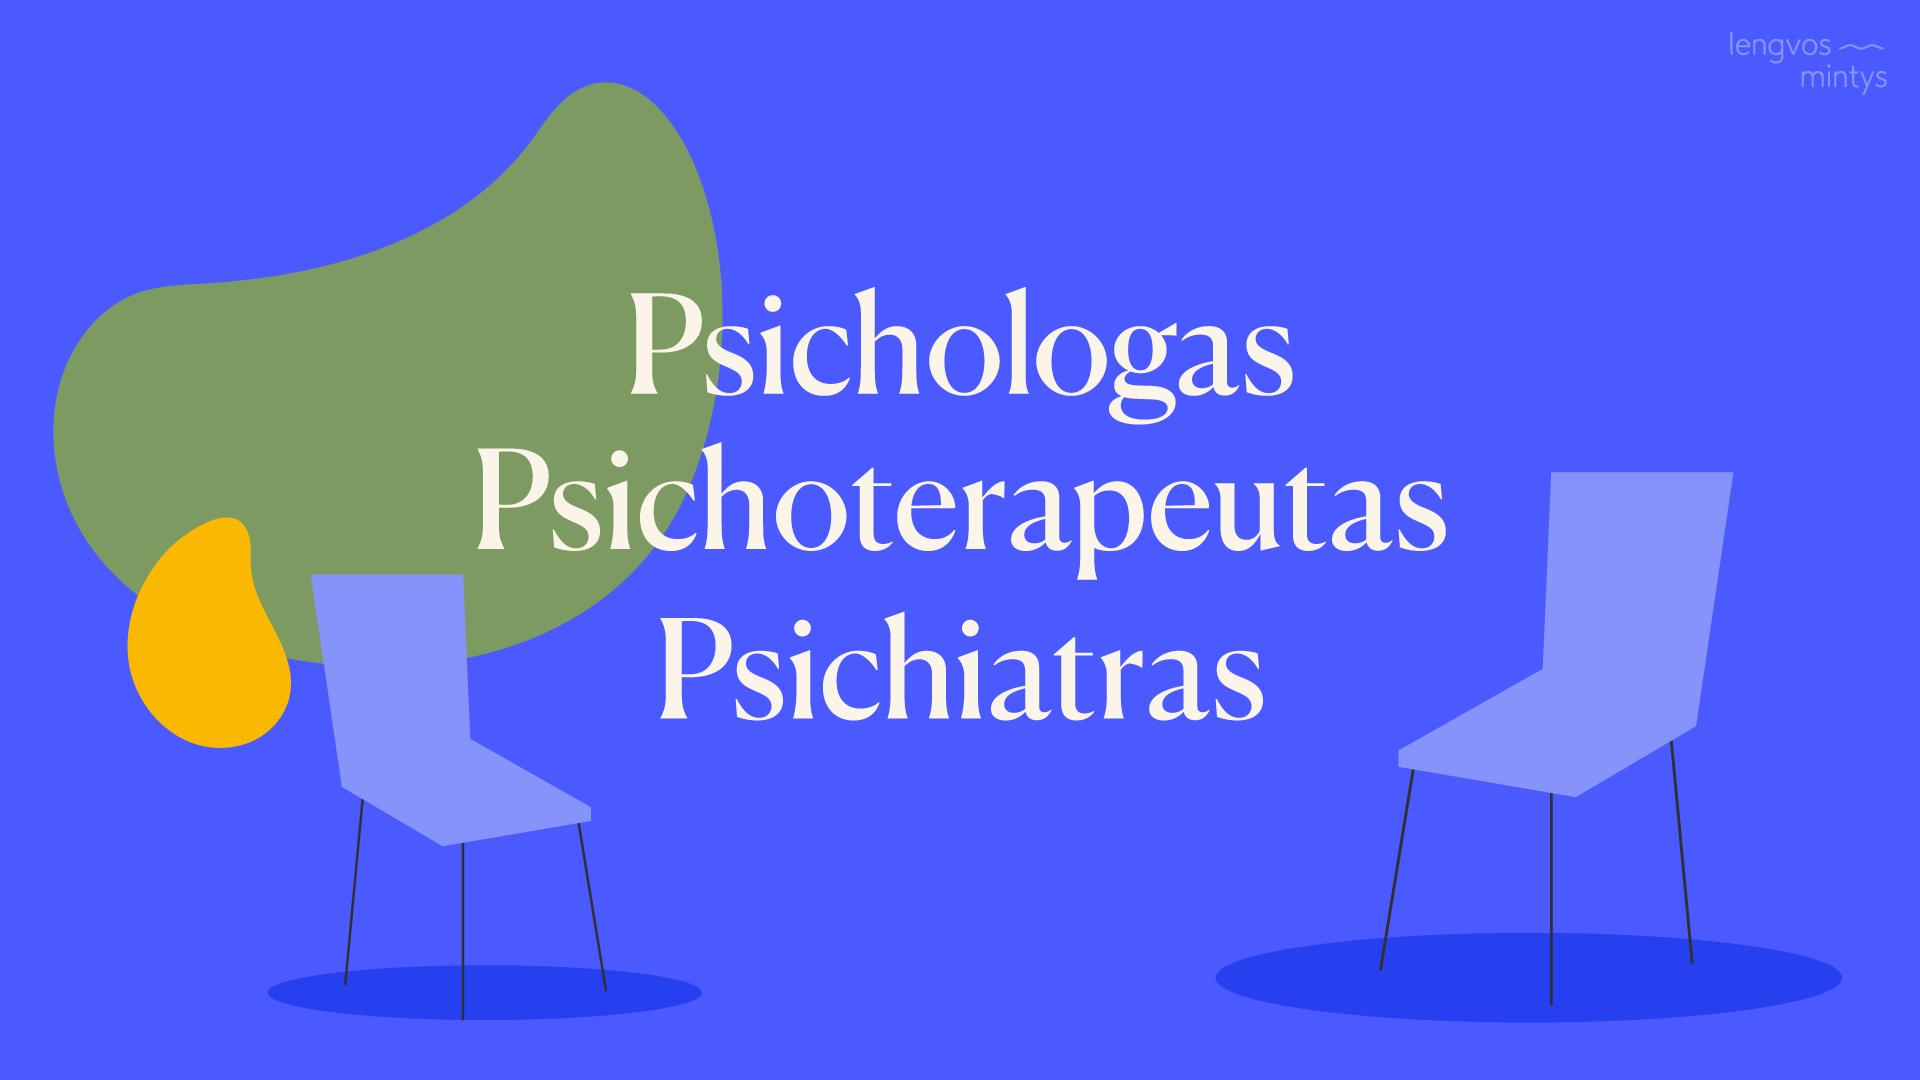 Psichoterapeutas